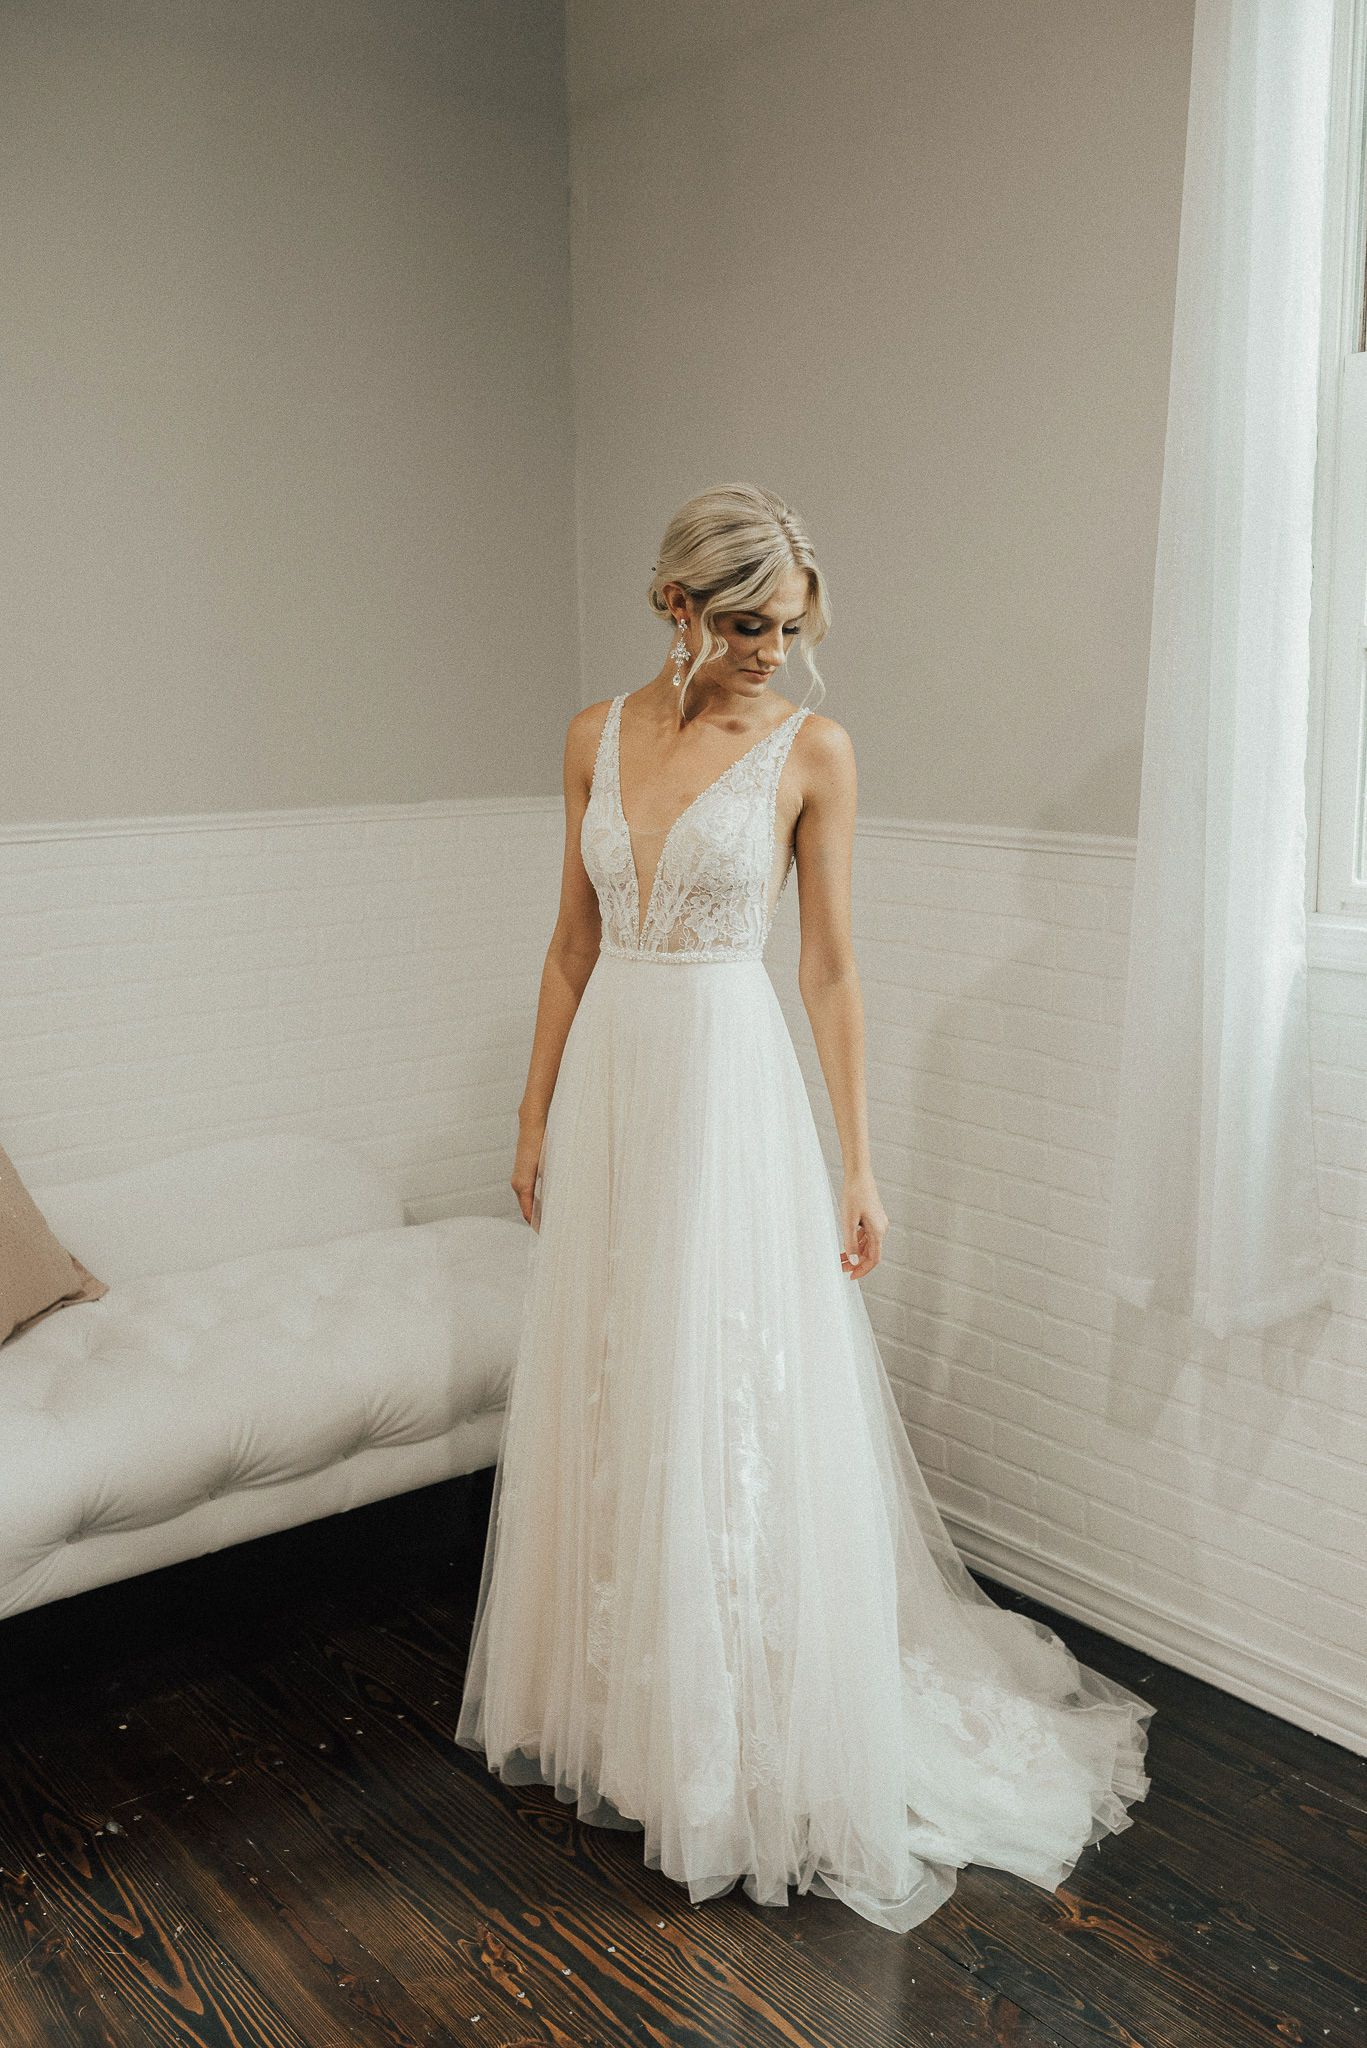 Paige Emily Hart Bridal Kansas City Wedding Dresses City Wedding Dress Wedding Dresses Illusion Neckline Wedding Dress